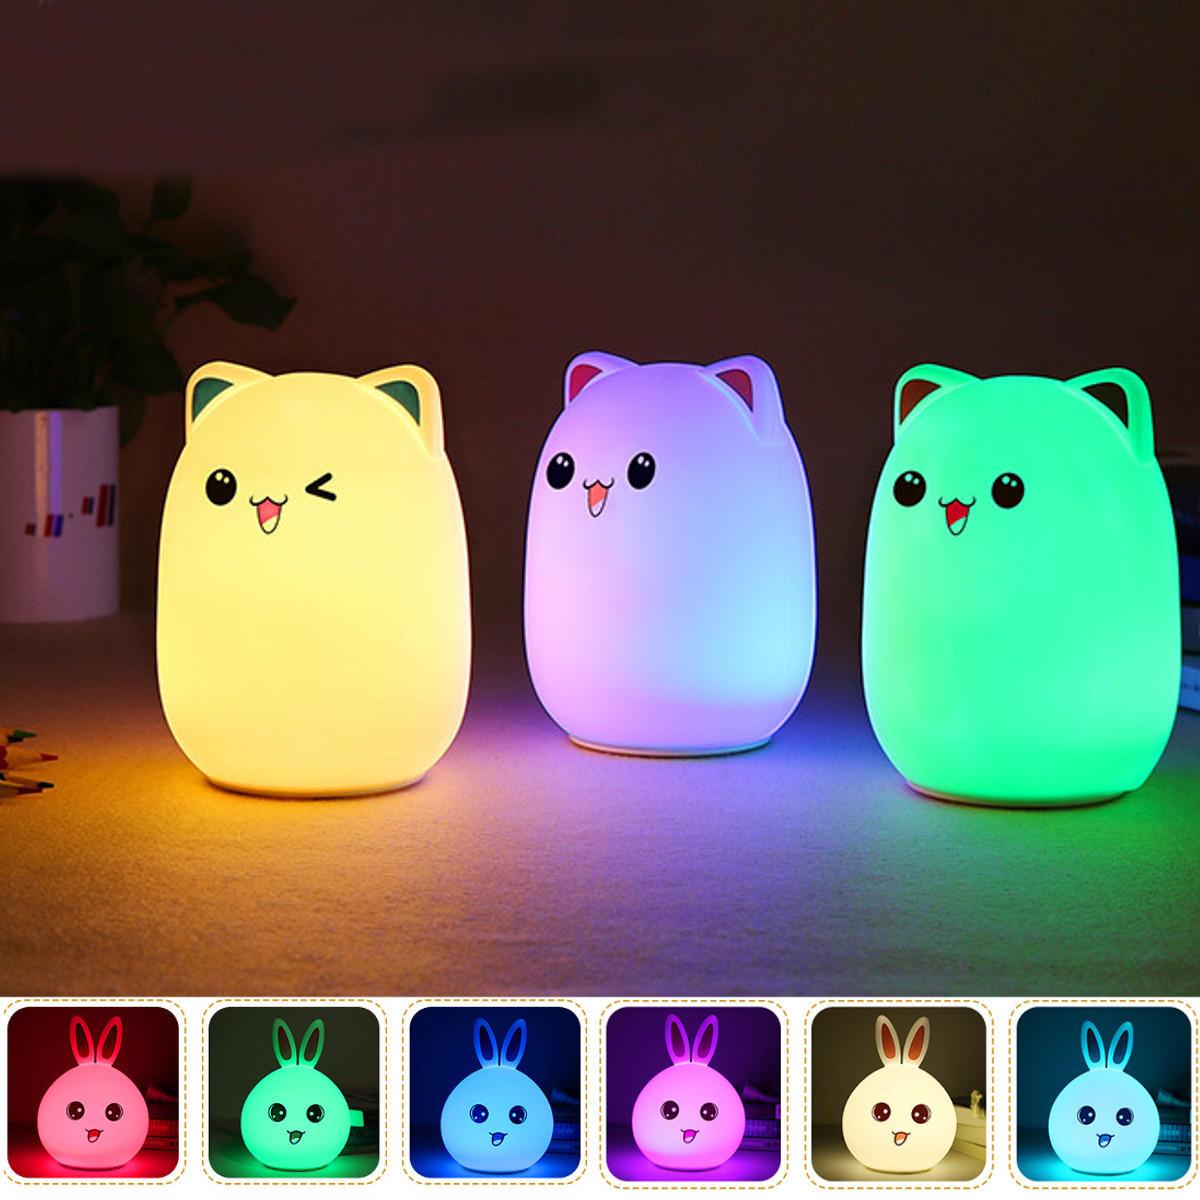 LED Lampu Malam Kecil Lampu Tidur Kamar Bayi Kelinci Lampu Anak-anak Beruang Tidur Lampu